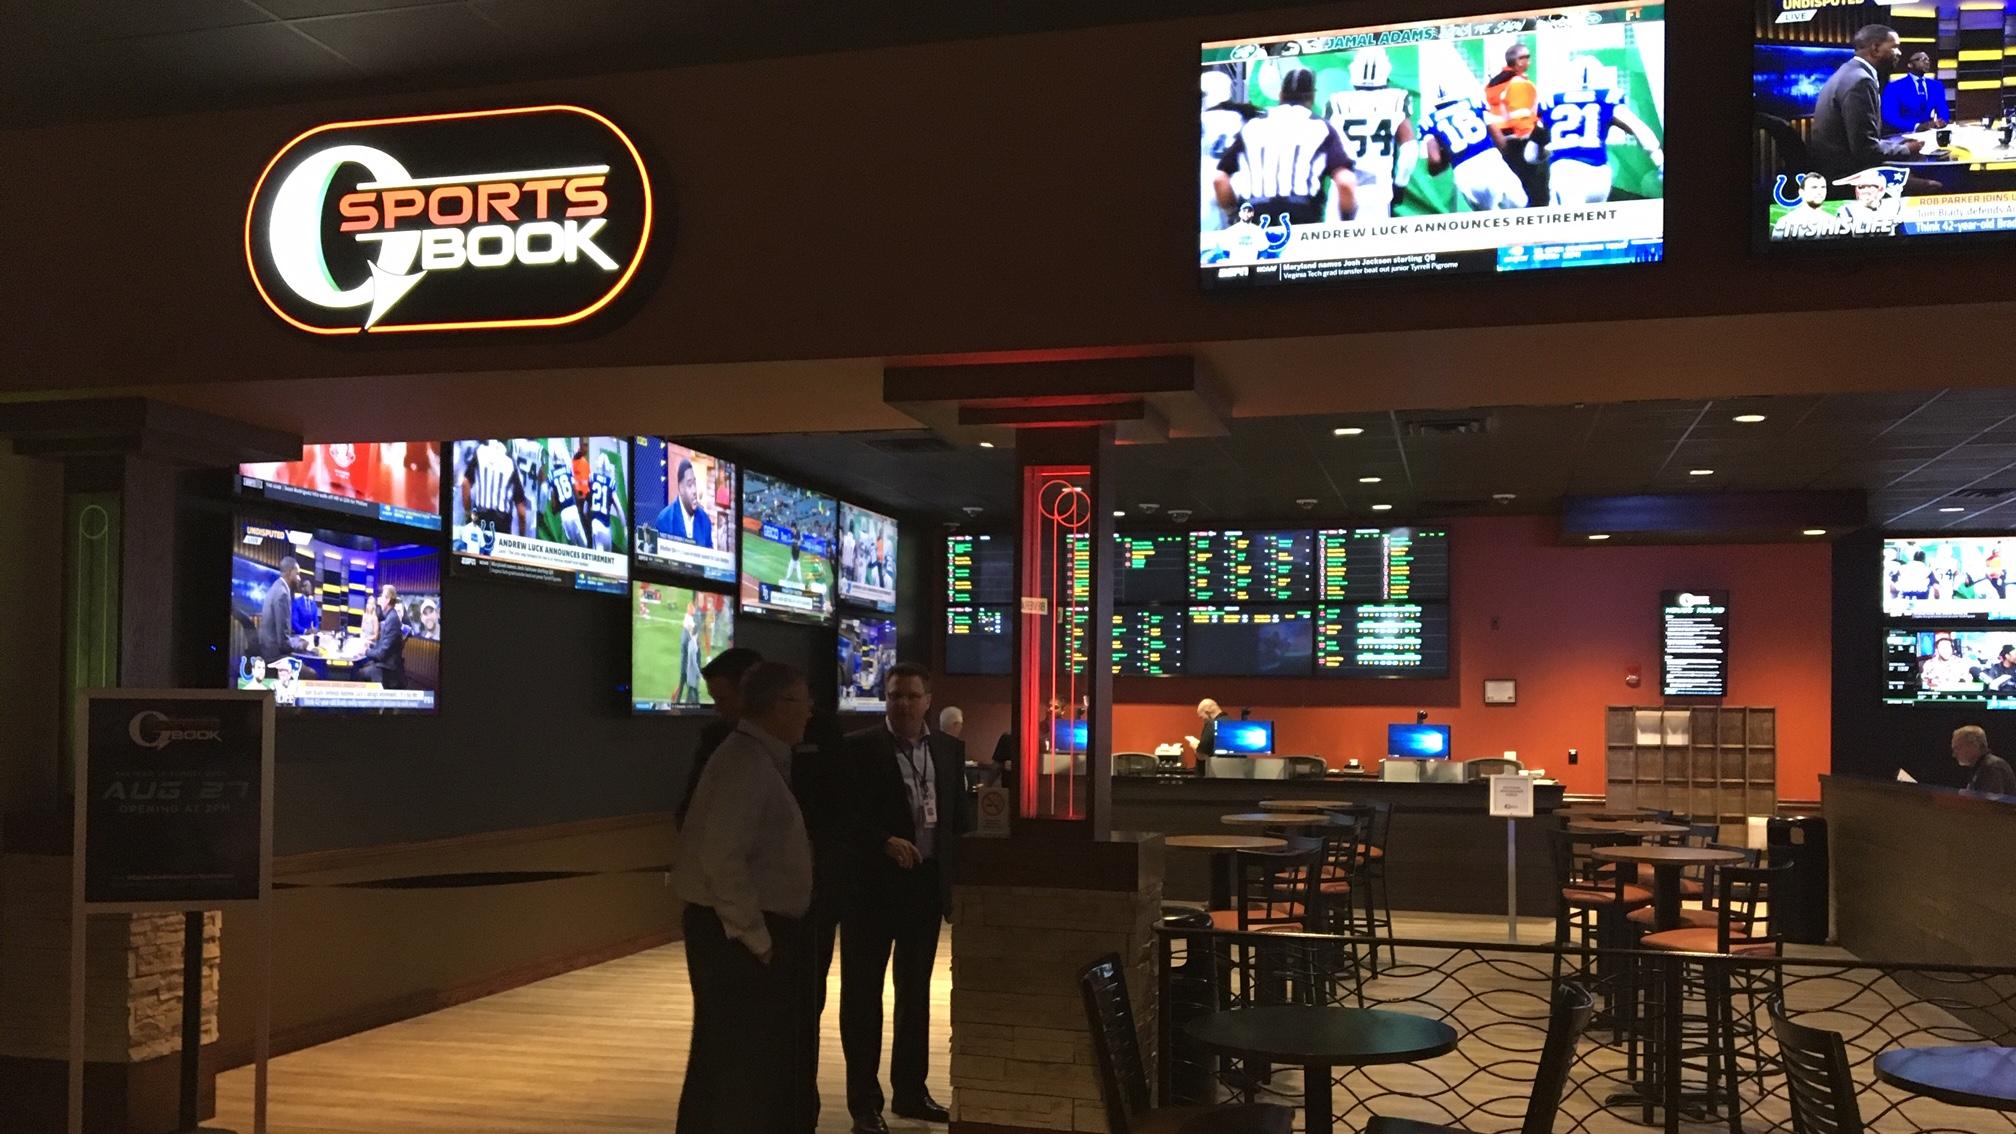 Diamond jo casino sports betting greyhound betting system uk